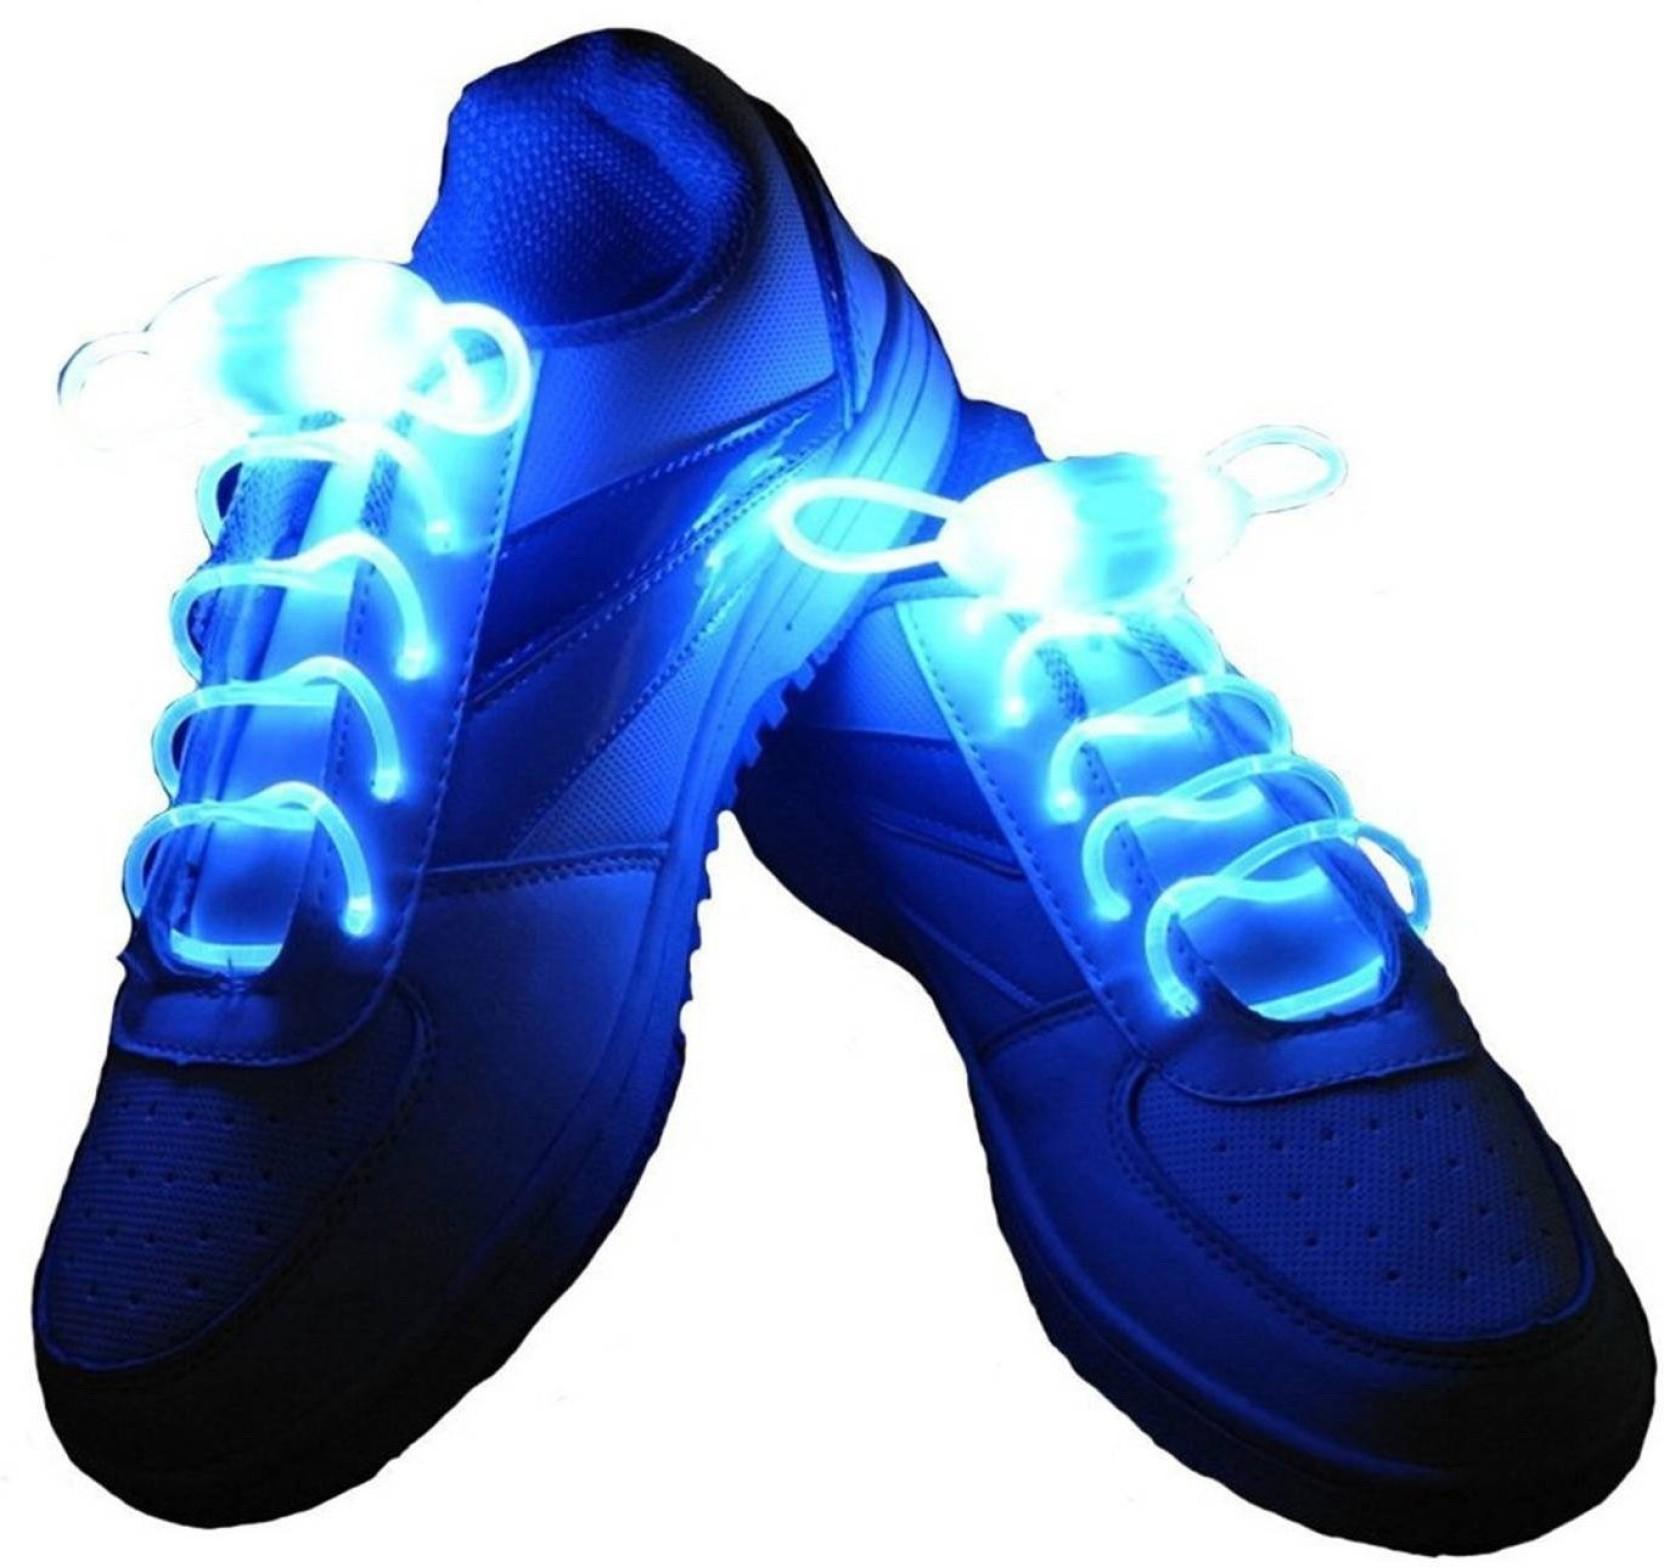 quality design no sale tax performance sportswear Trendzino ® LED Shoelaces, Multi-Color Light Up Shoe Laces Shoe ...